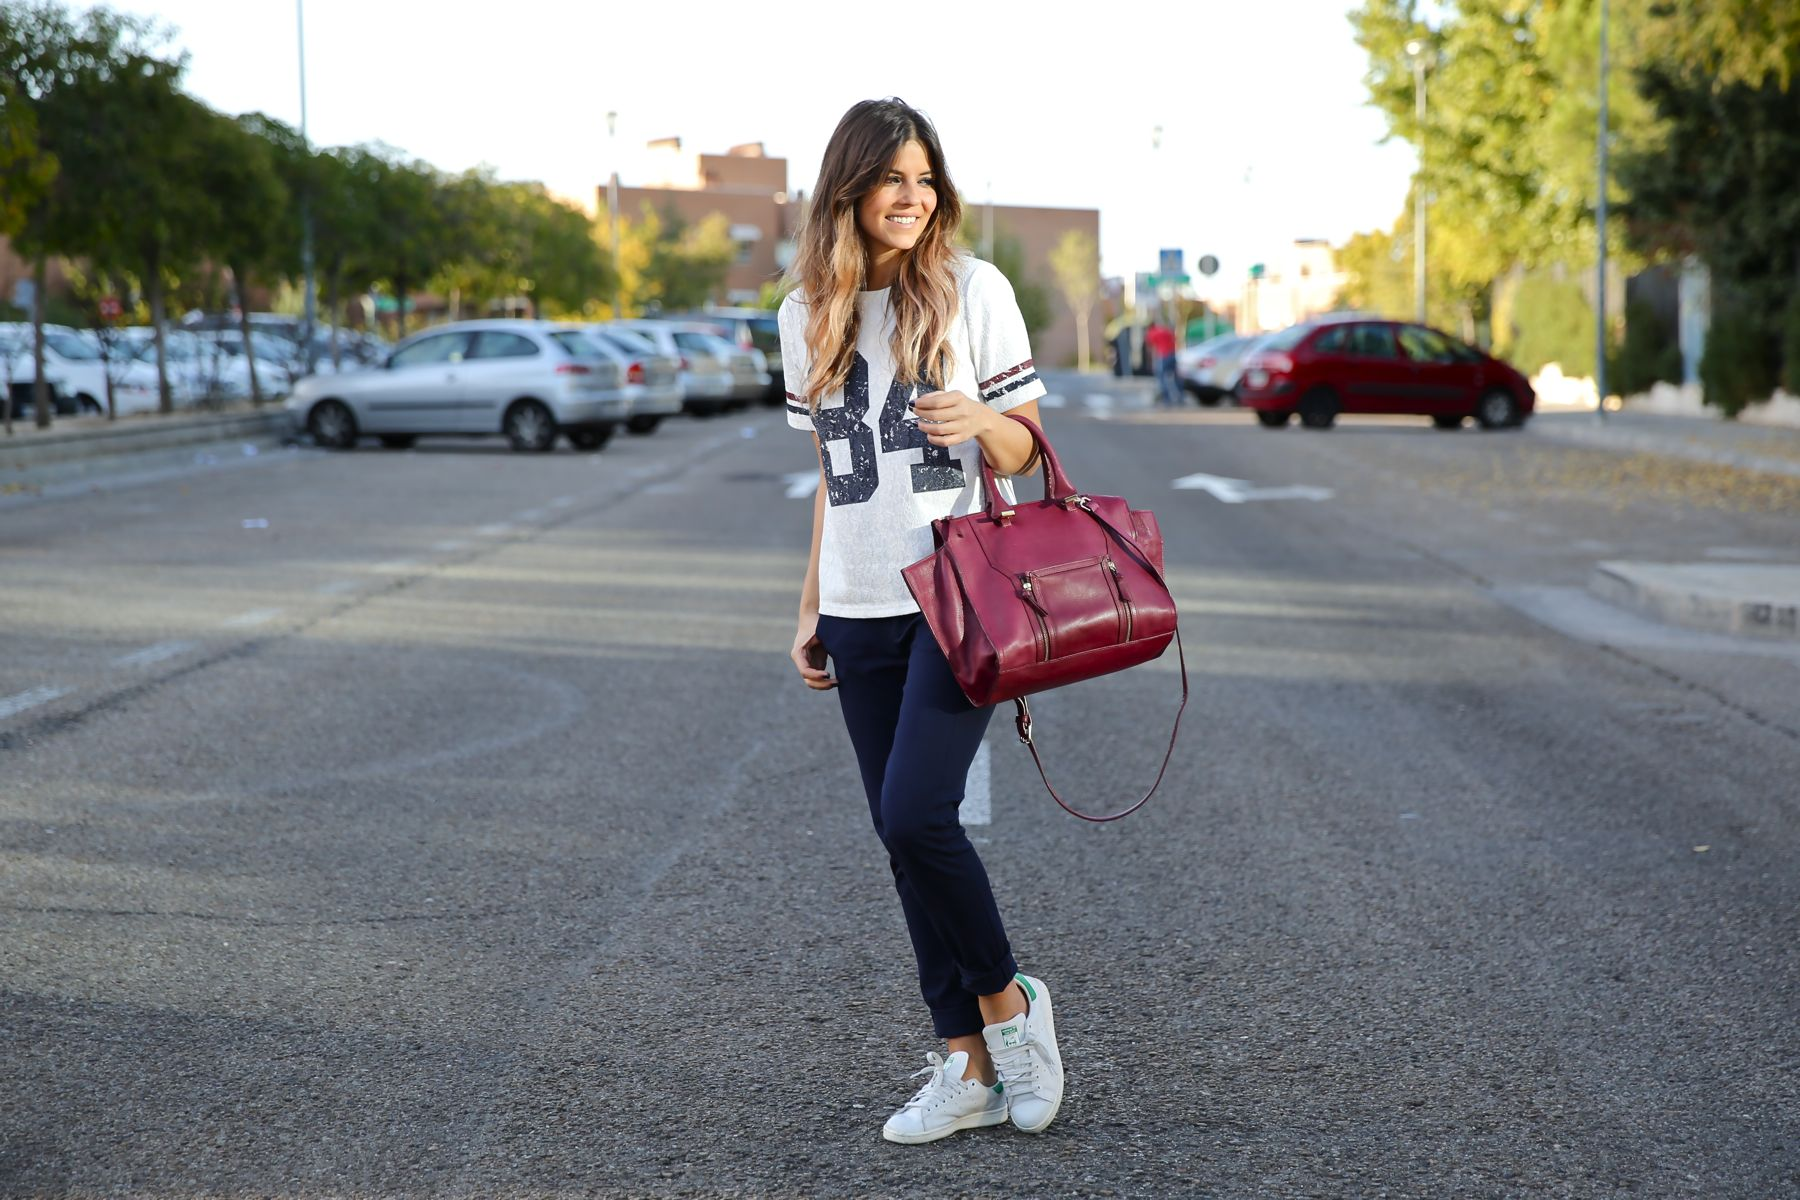 trendy_taste-look-outfit-street_style-ootd-blog-blogger-fashion_spain-moda_españa-zara-stan_smith-adidas-cosette-tee-baseball-camiseta-numero-pantalón-capri-pinzas-11